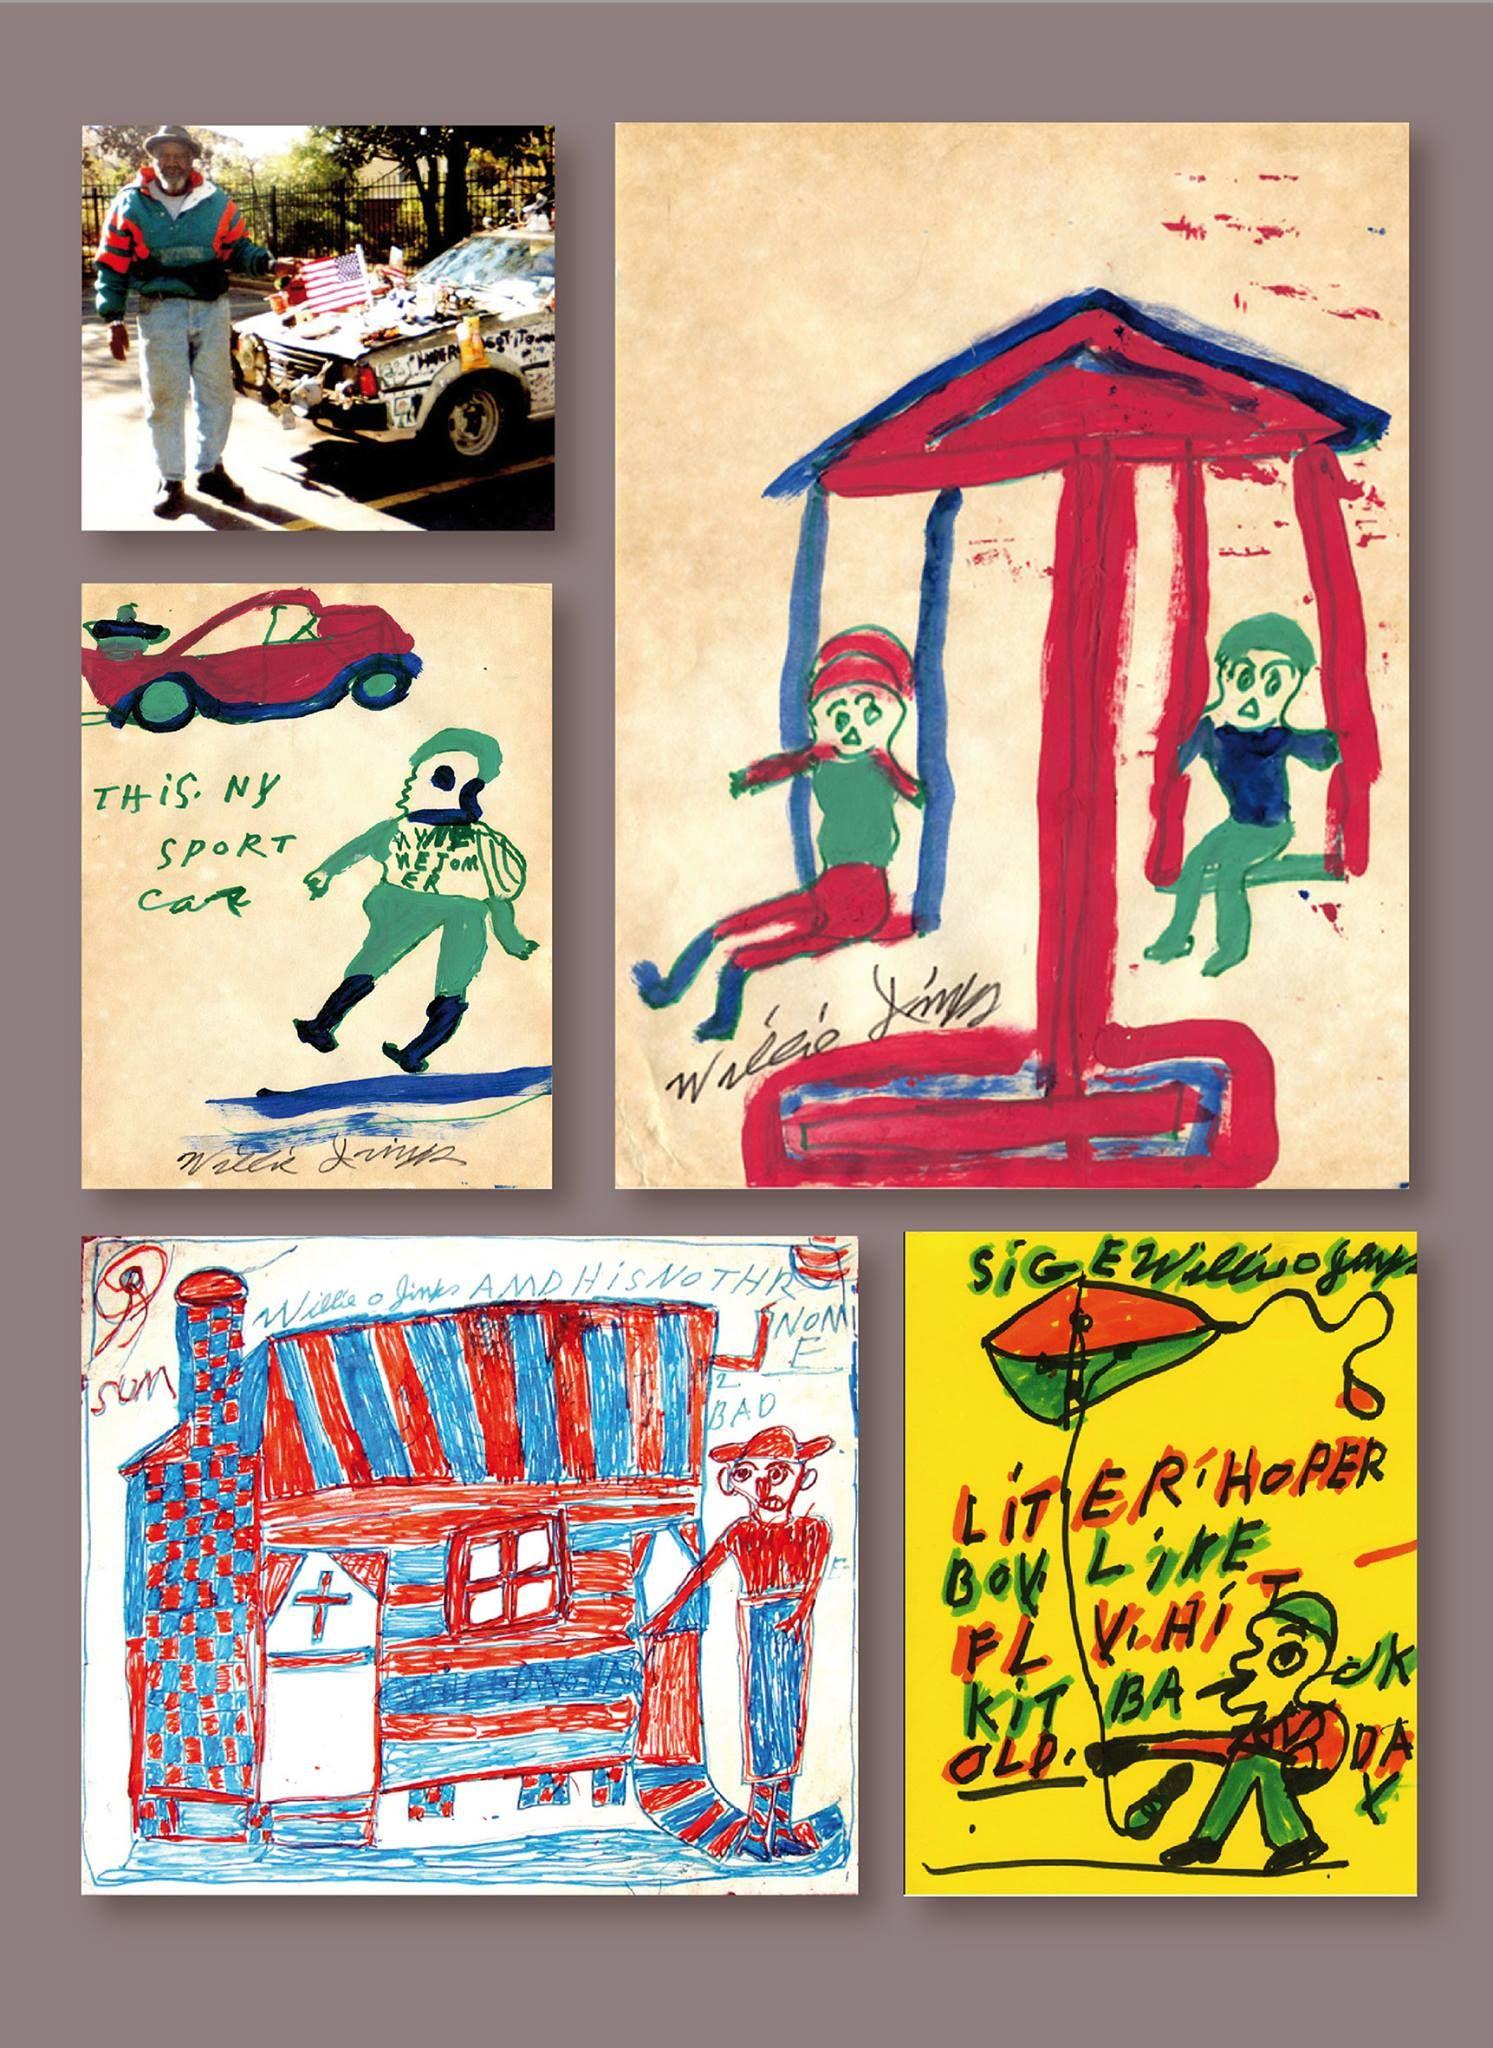 Bad design zeichnung willie jinks was an afroamerican artist born  as one of